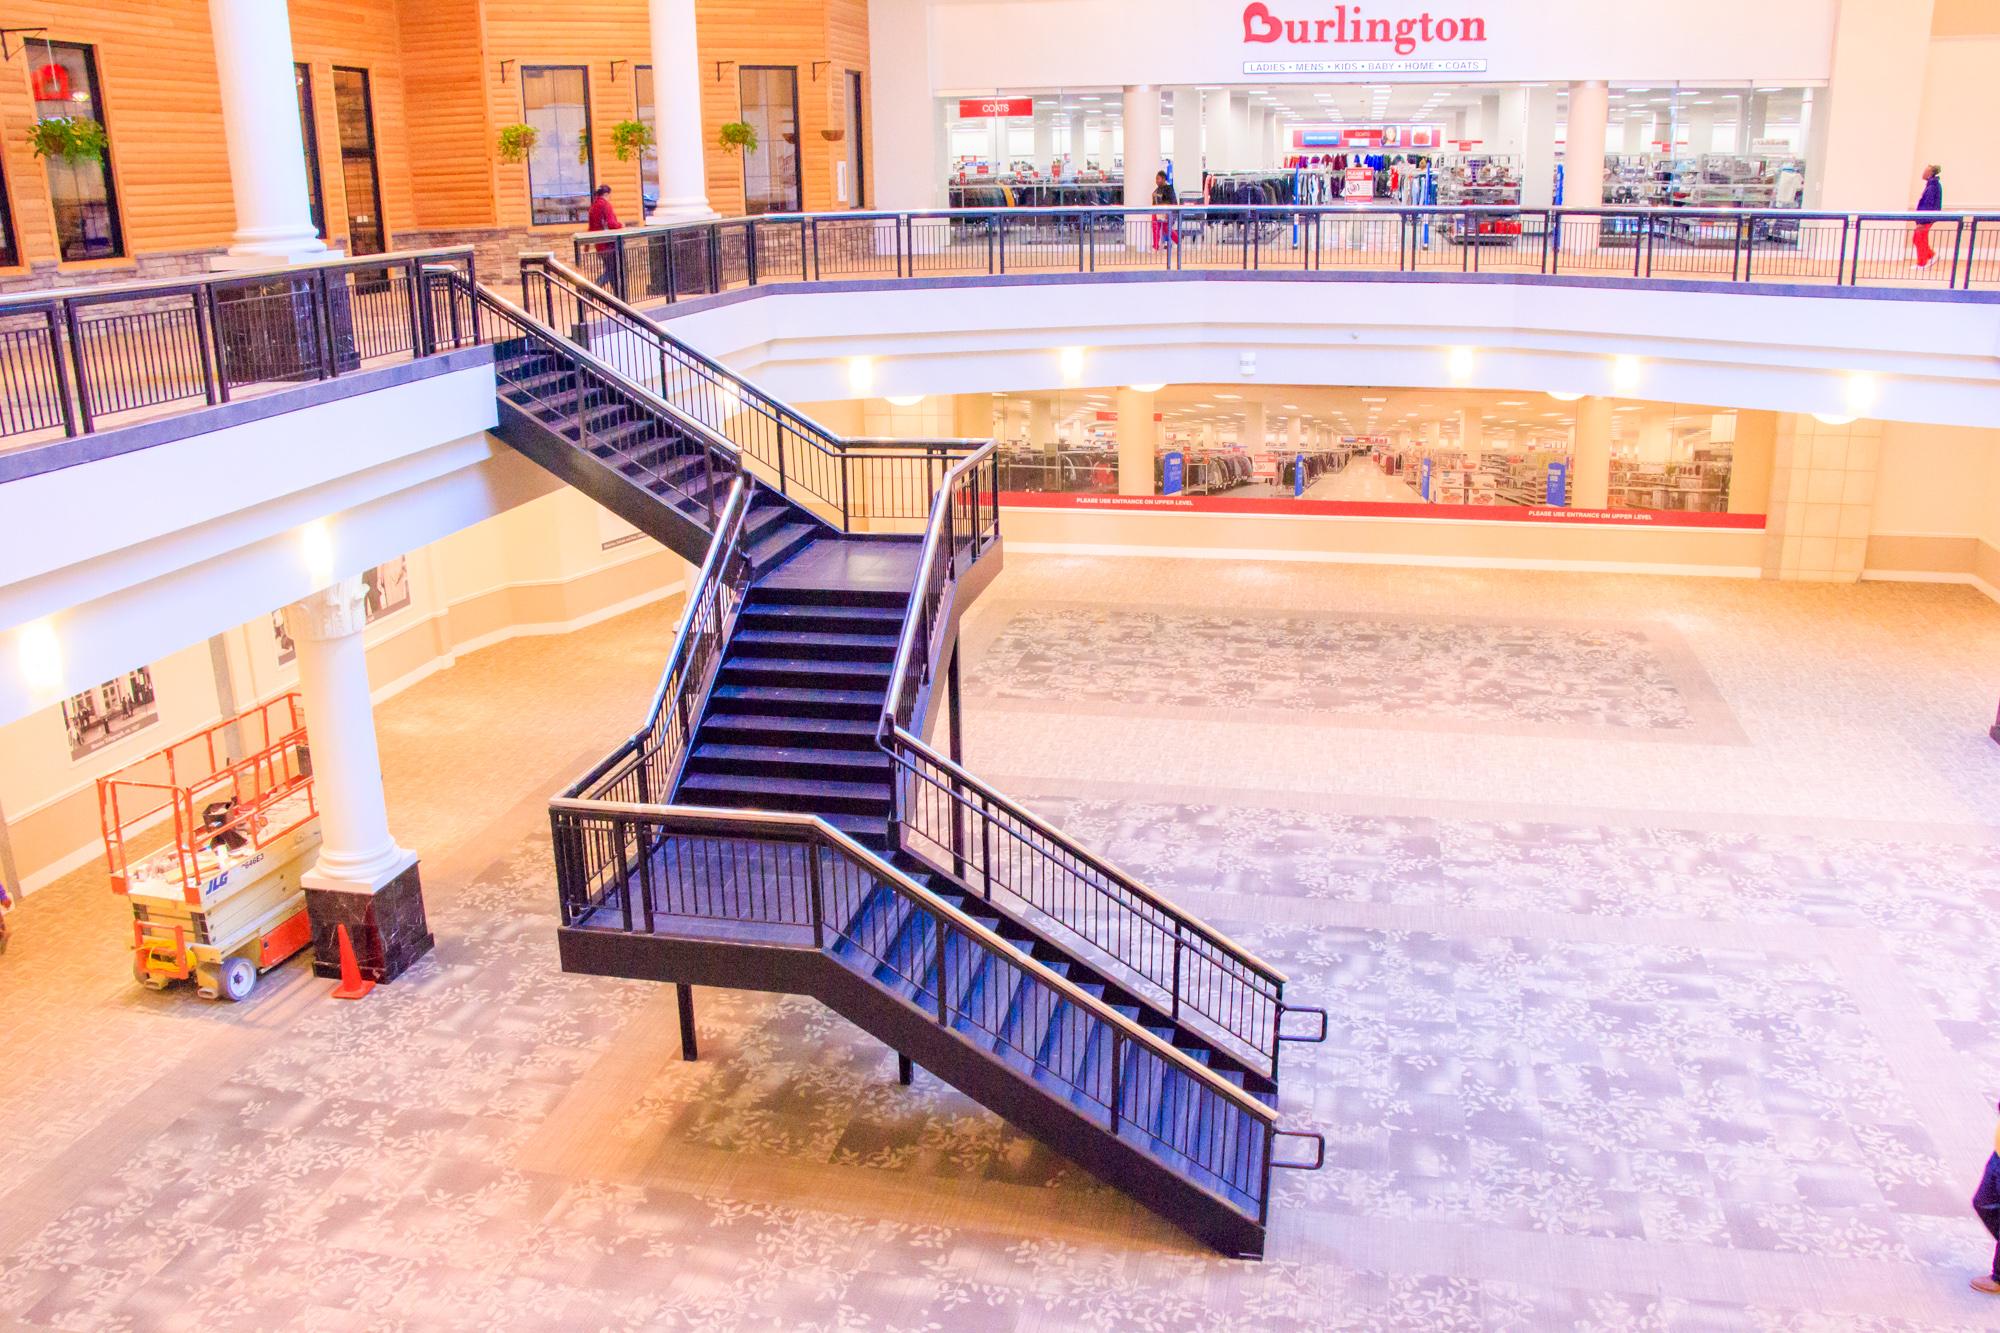 mall_IMG_8011-62.jpg